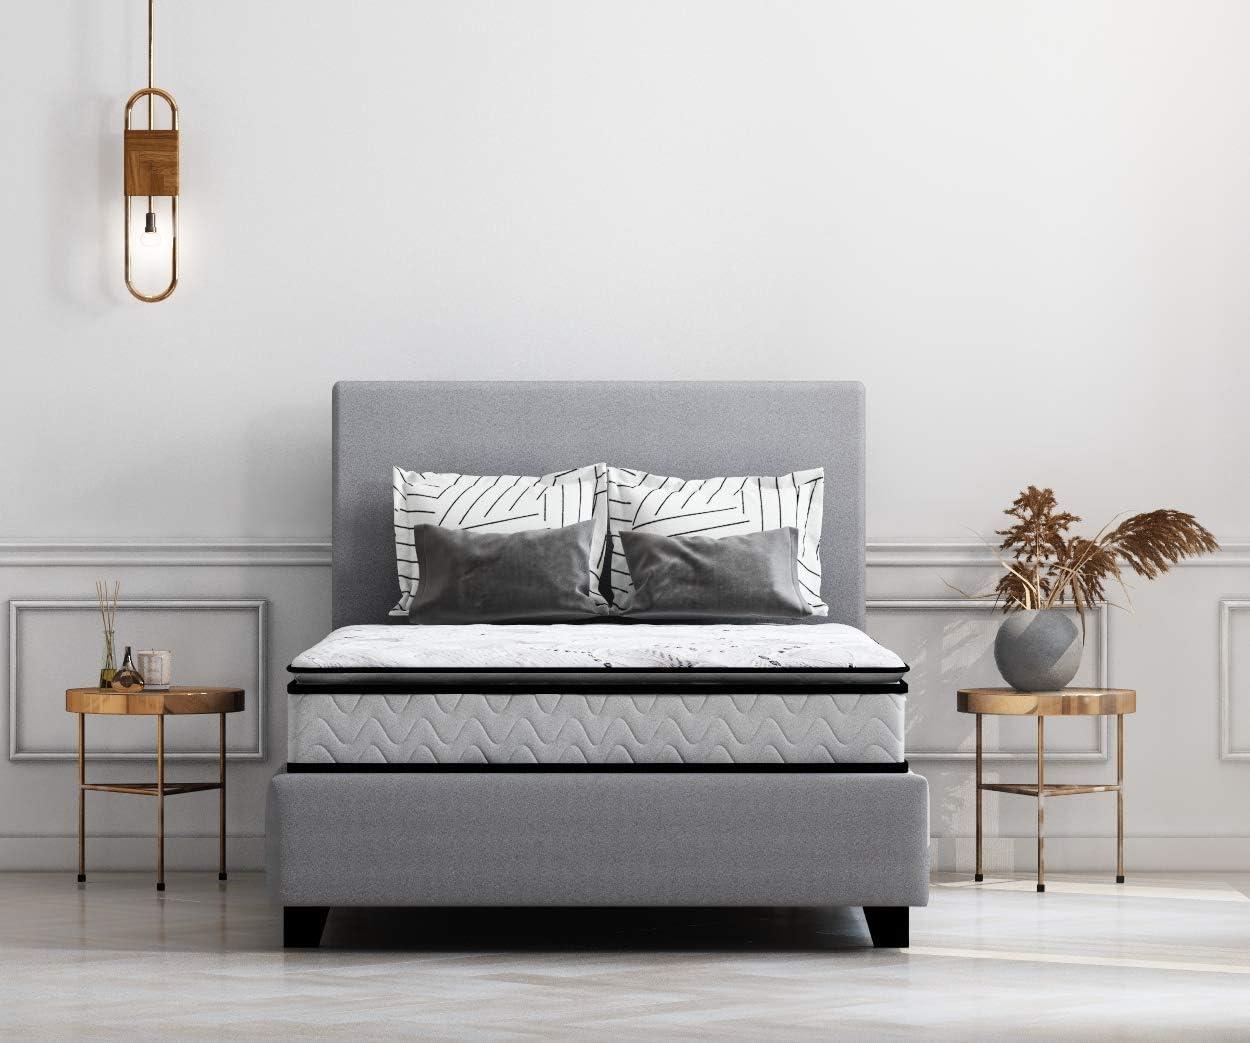 Ashley Furniture Signature Design - 10 Inch Bonnell Pillow Top Mattress - Full Size - White